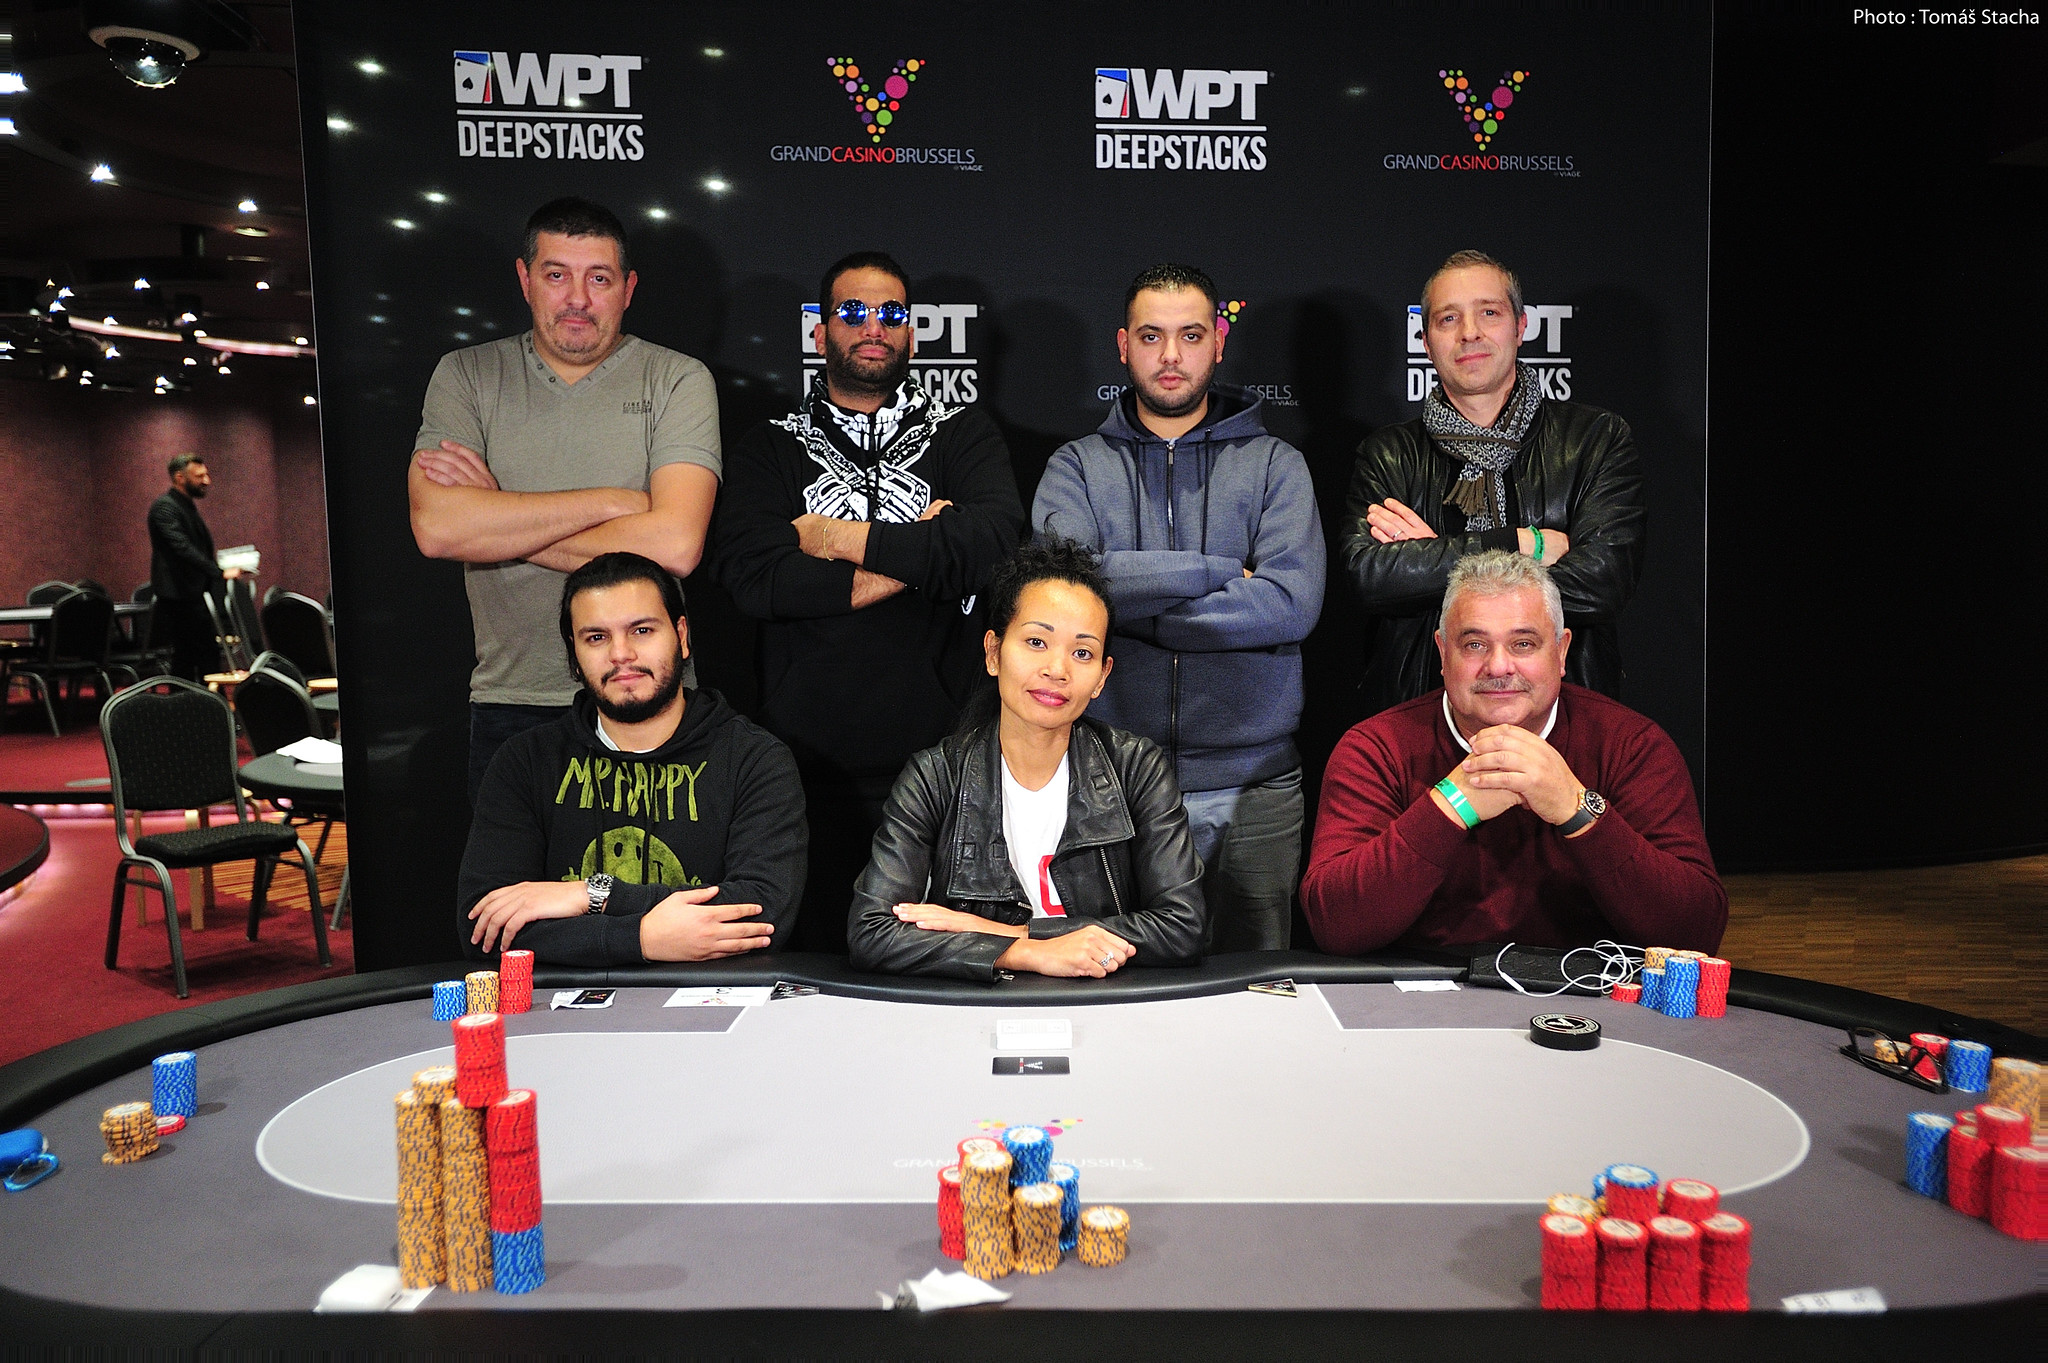 Nuno Duarte 4º (€22,5K) e António Mendes 7º (€10K) no High roller do WPTDS Brussels - Pokernews